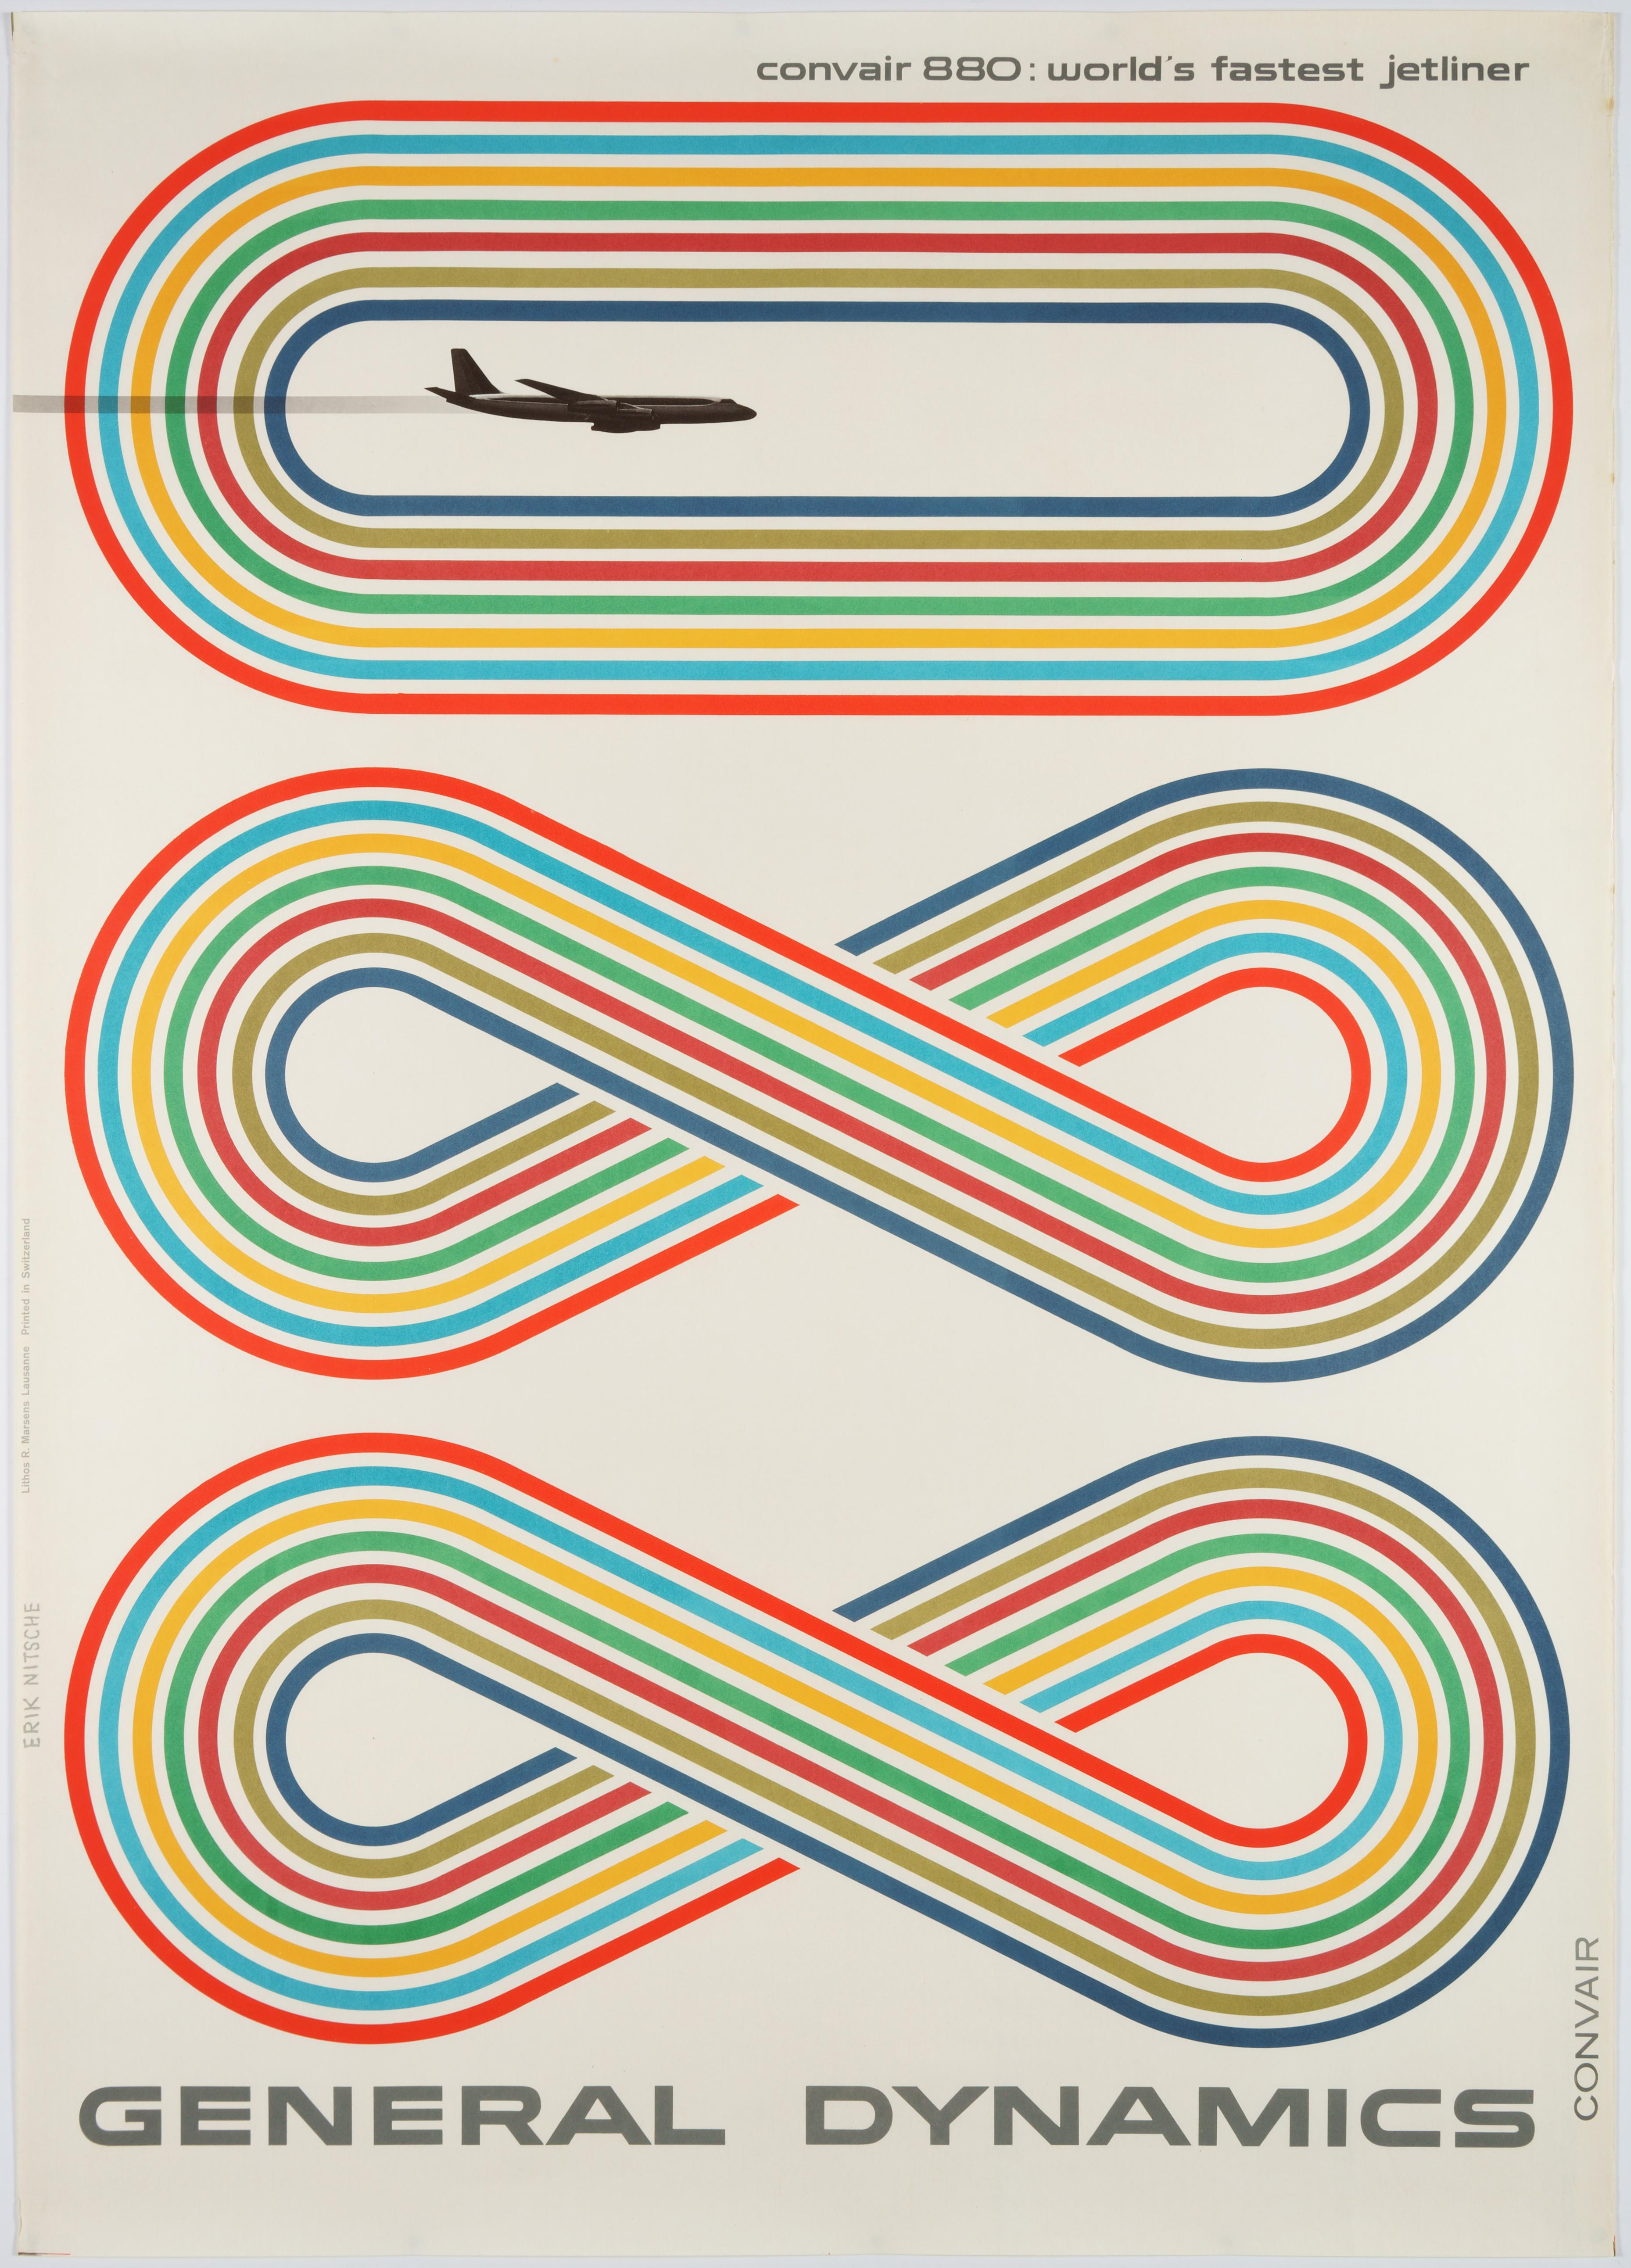 General Dynamics, Convair 880, World's Fastest Jetliner – Original Poster